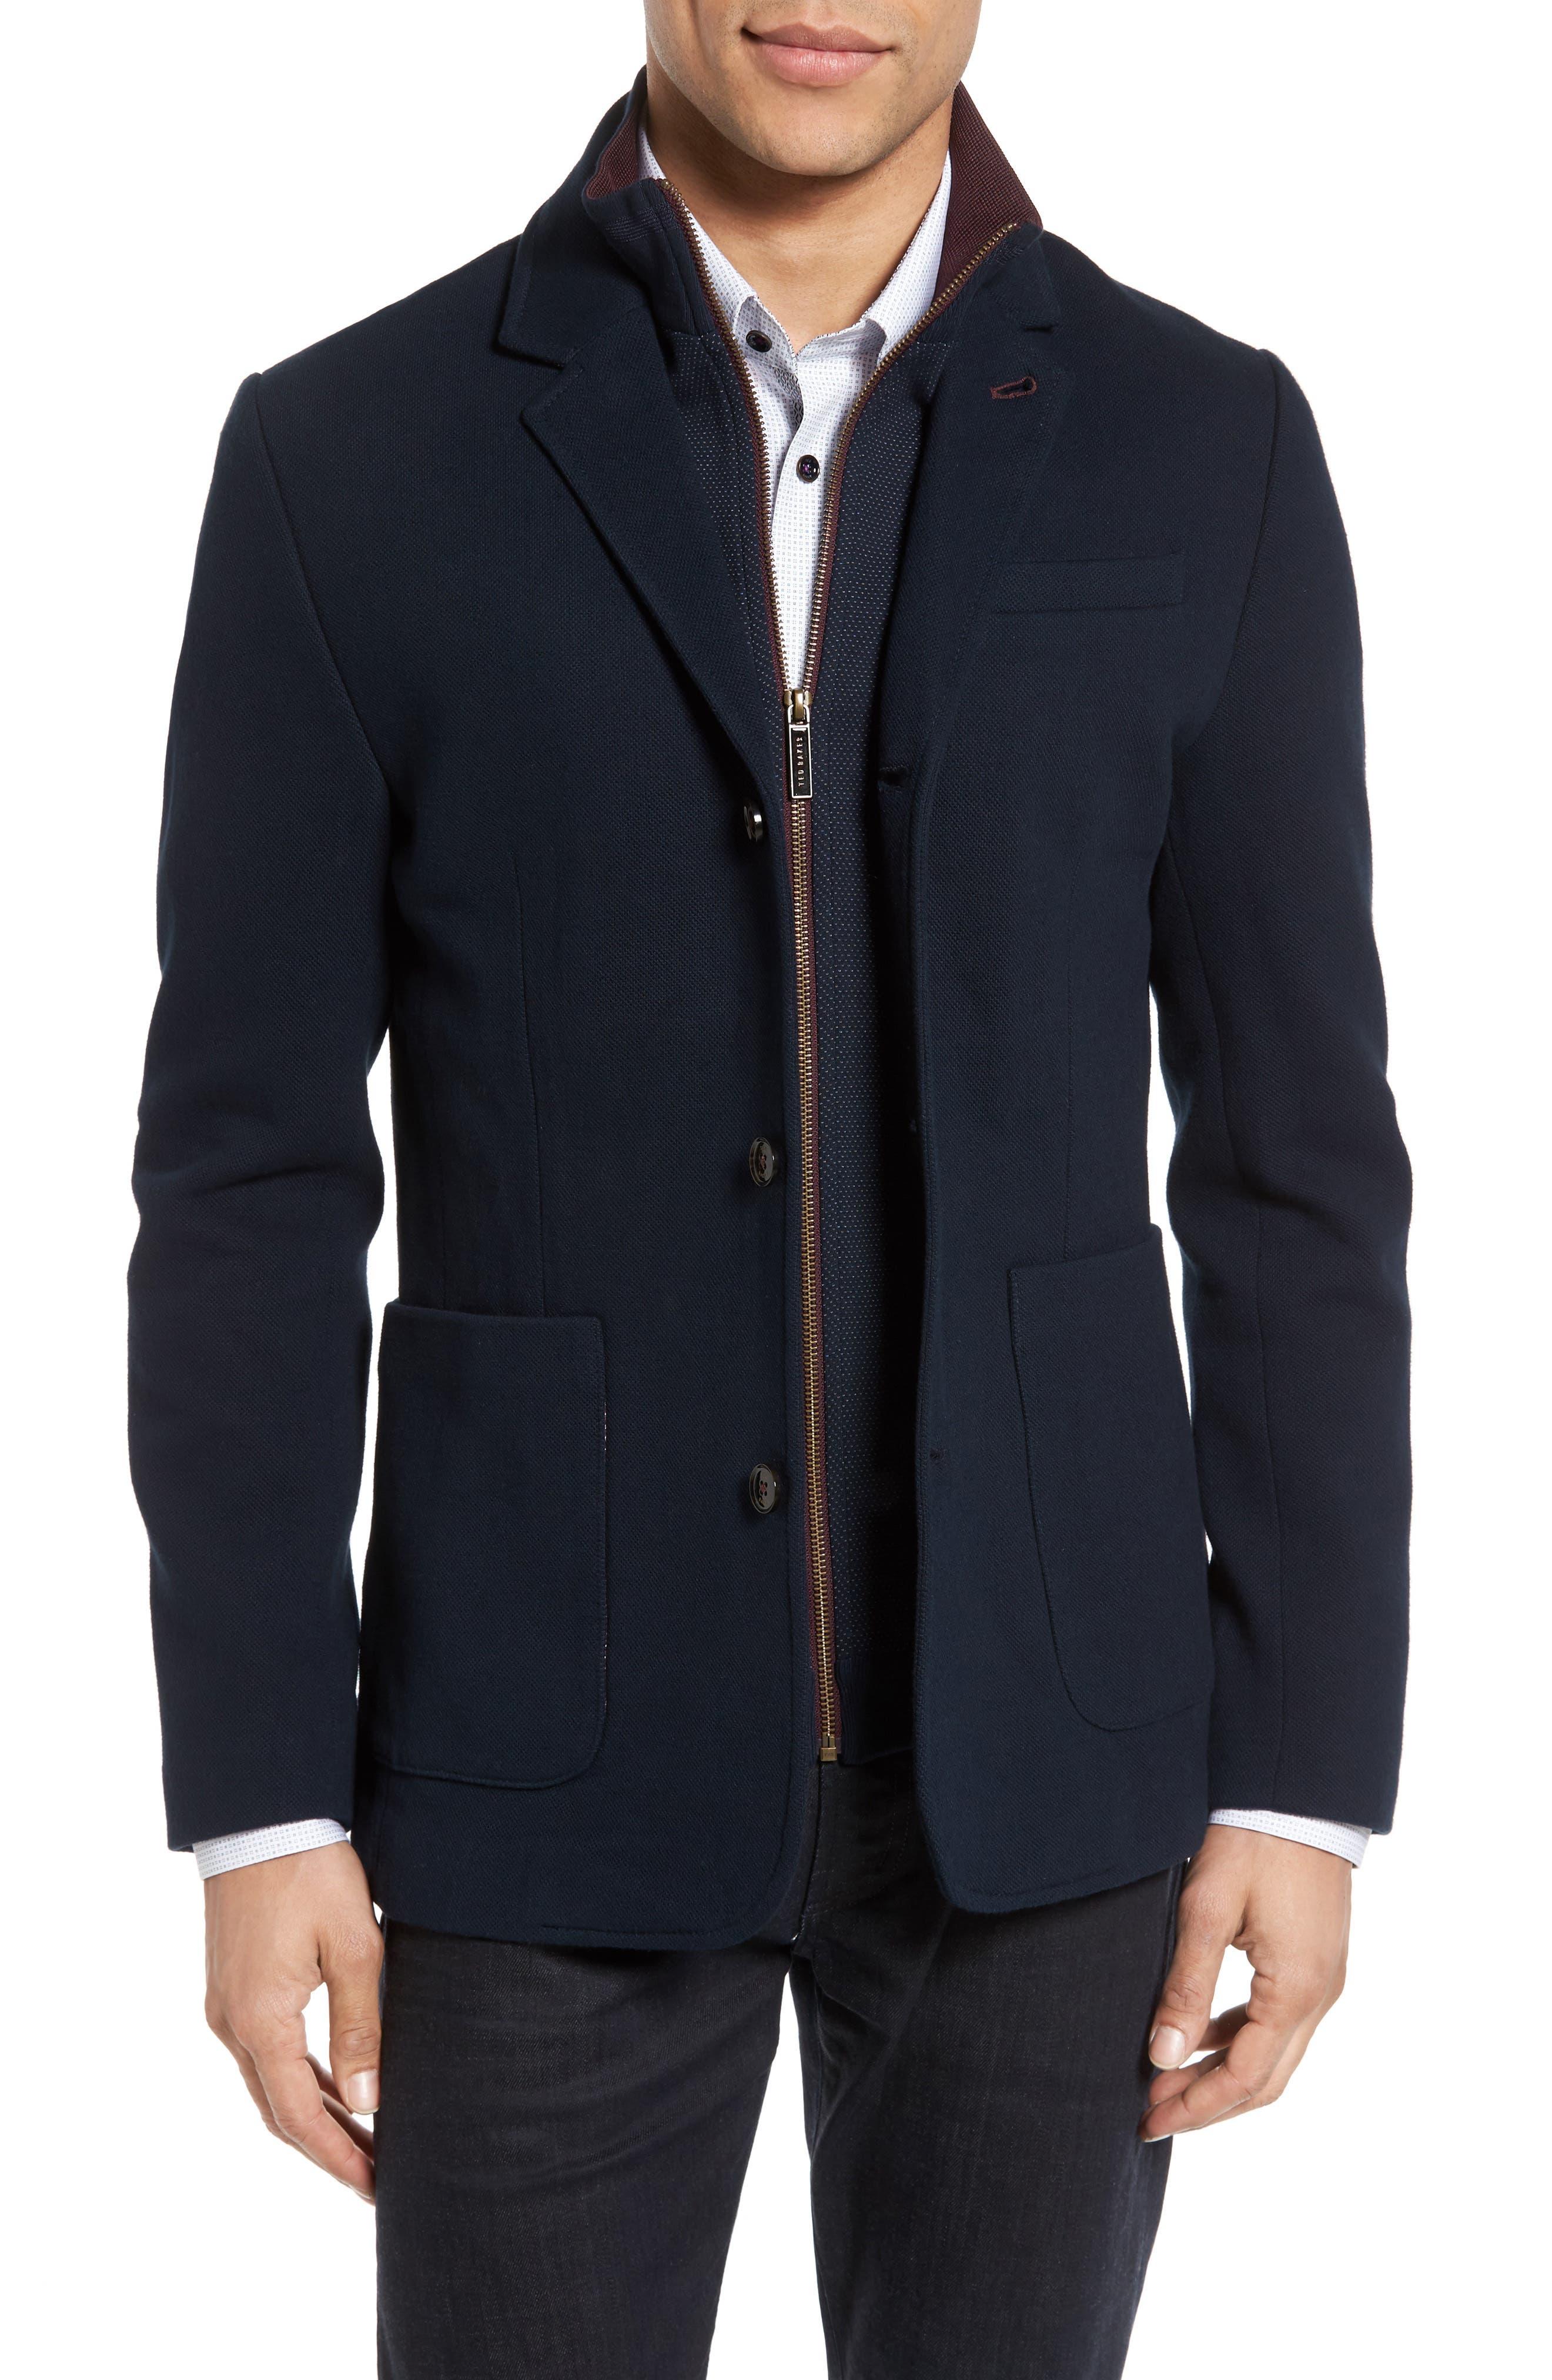 Ted Baker London Knit Bib Inset Three-Button Jacket